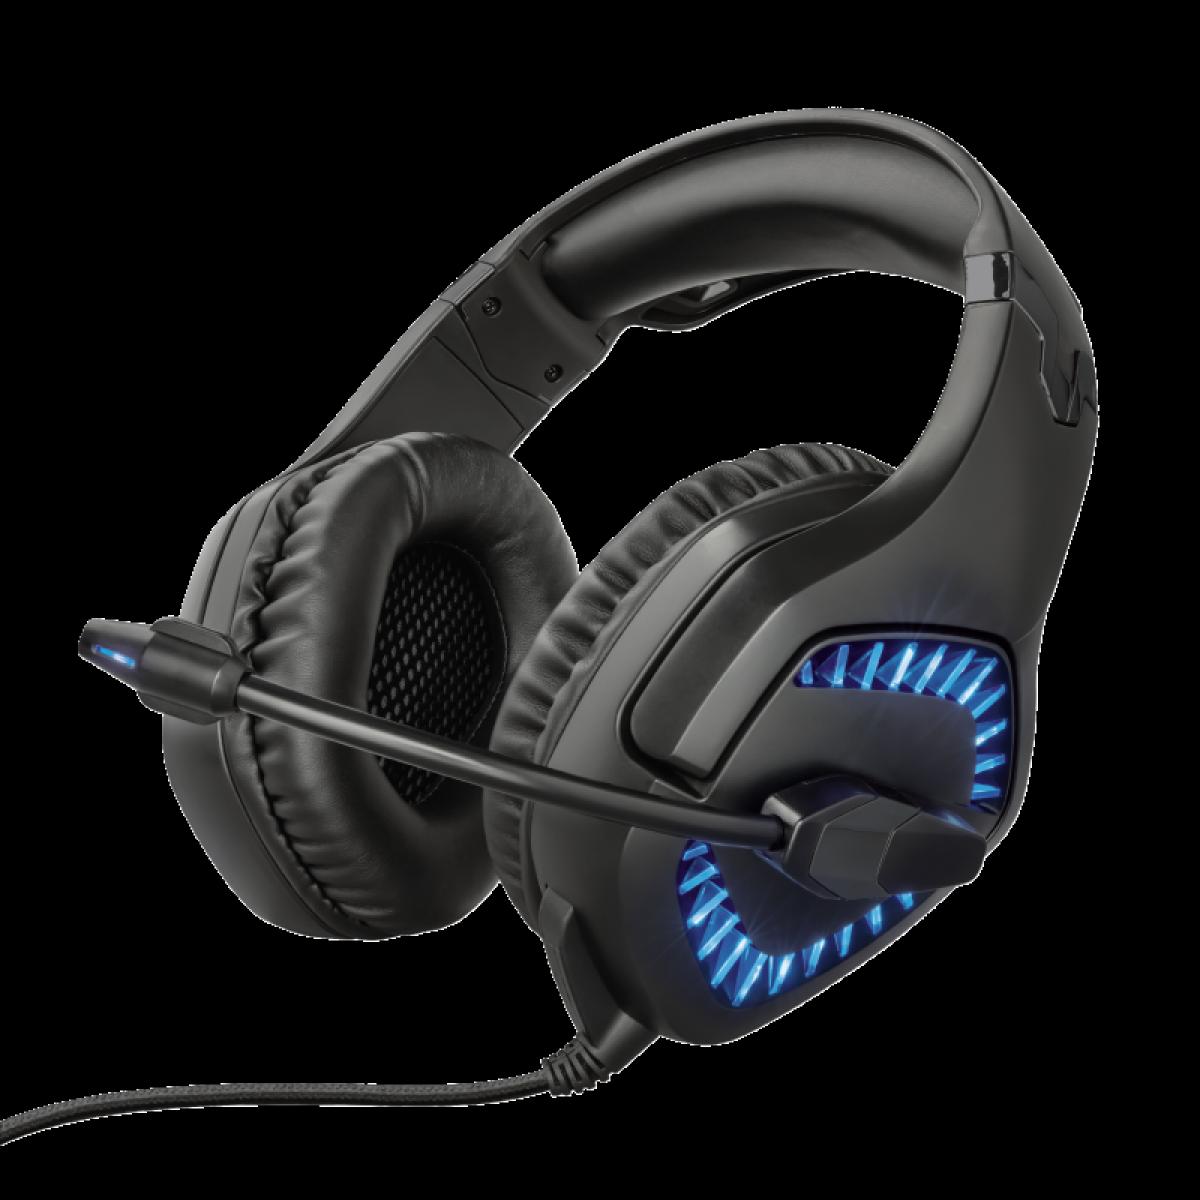 Headset Gamer Trust Varzz Illuminated, PC e Laptop, GXT460